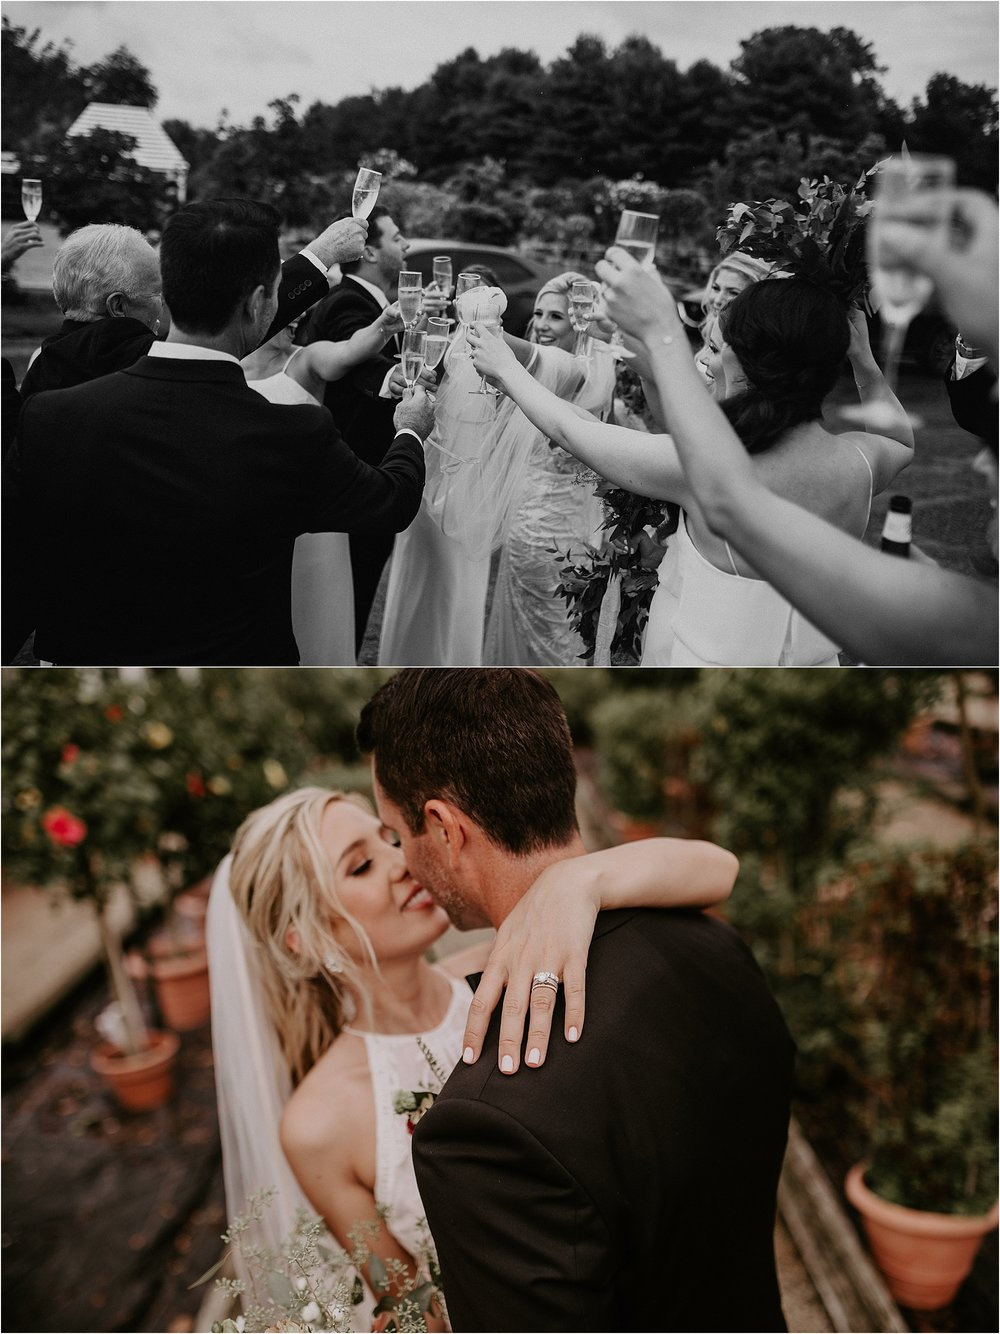 Sarah_Brookhart_Hortulus_Farm_Garden_and_Nursey_Wedding_Photographer_0051.jpg